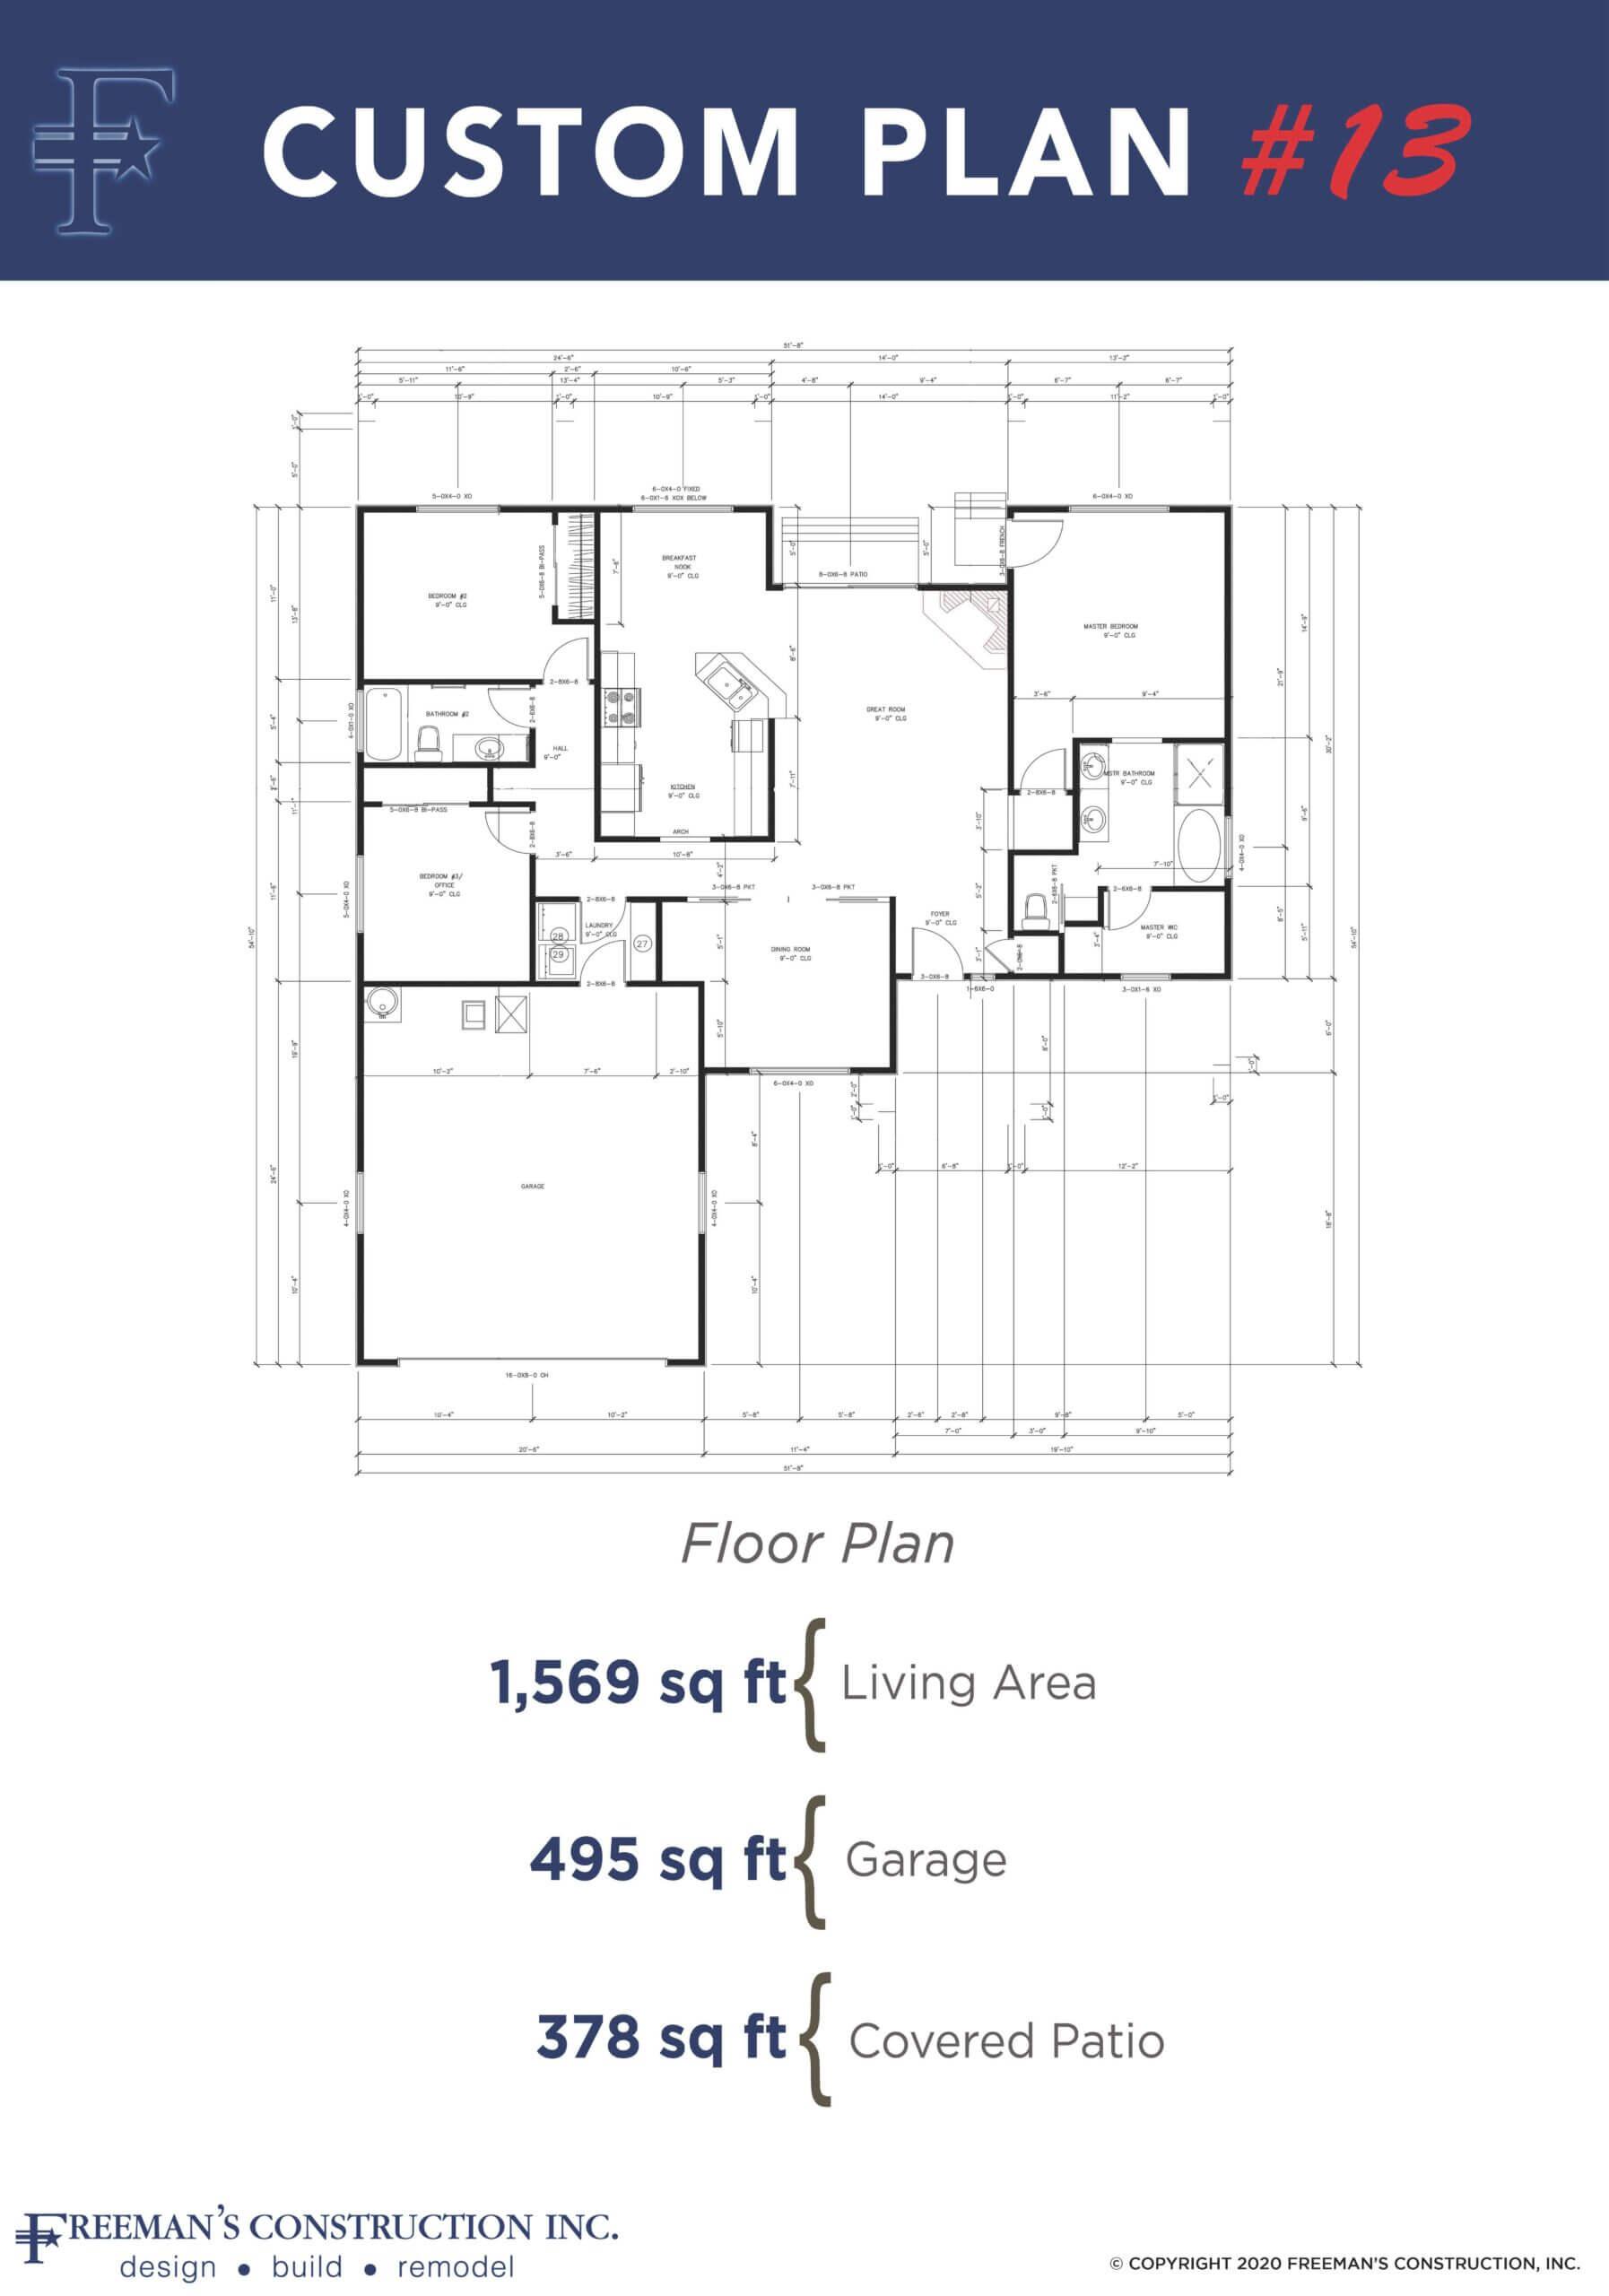 custom-home-floor-plan-13-in-san-diego-county-ca-by-freemans-construction-inc